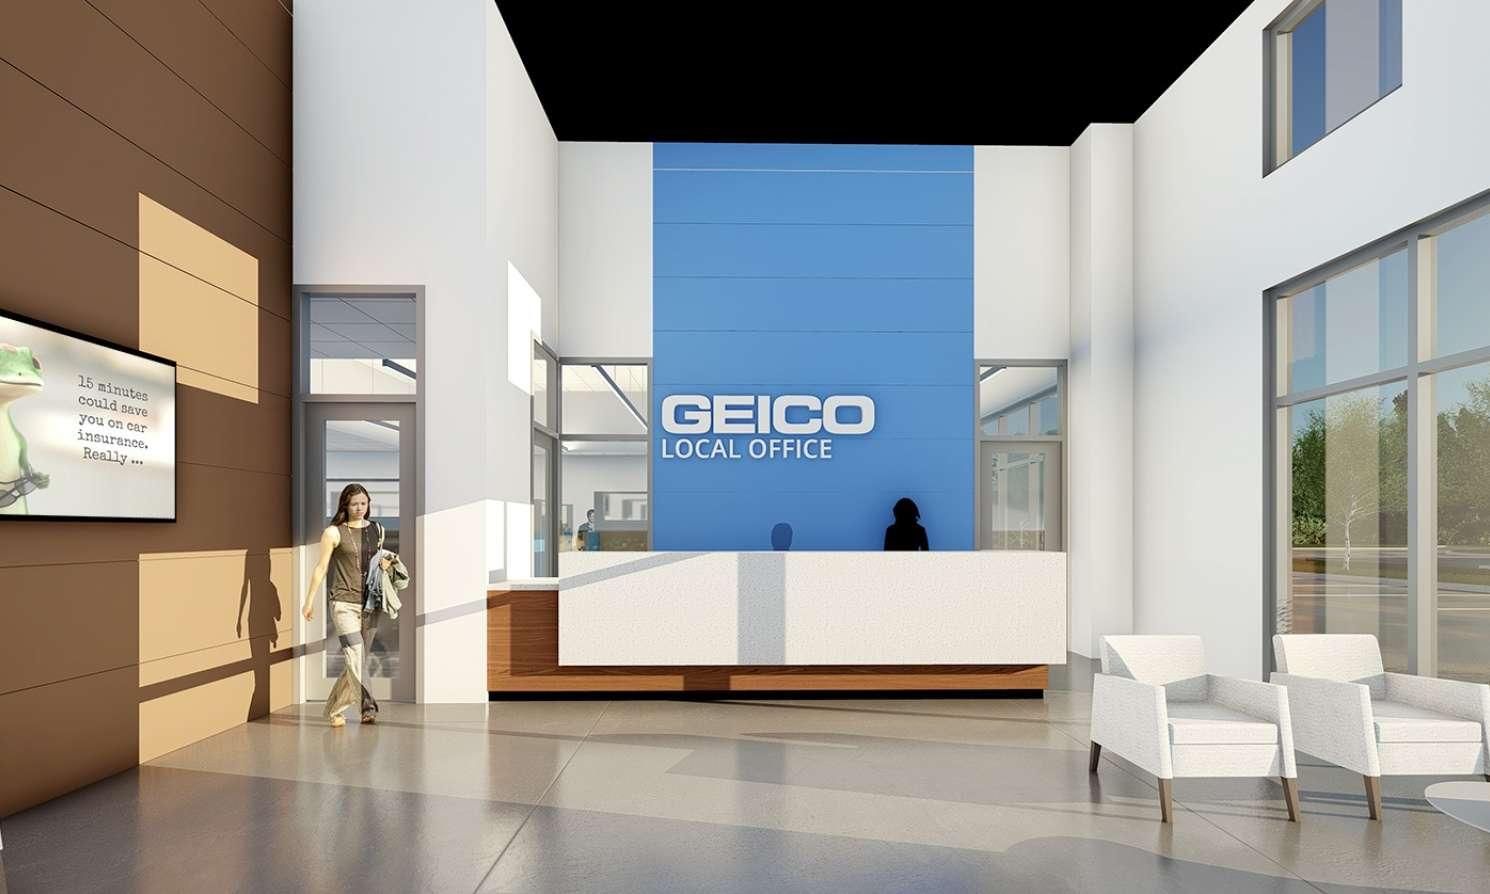 Geico Baton Rouge Office Lobby Interior